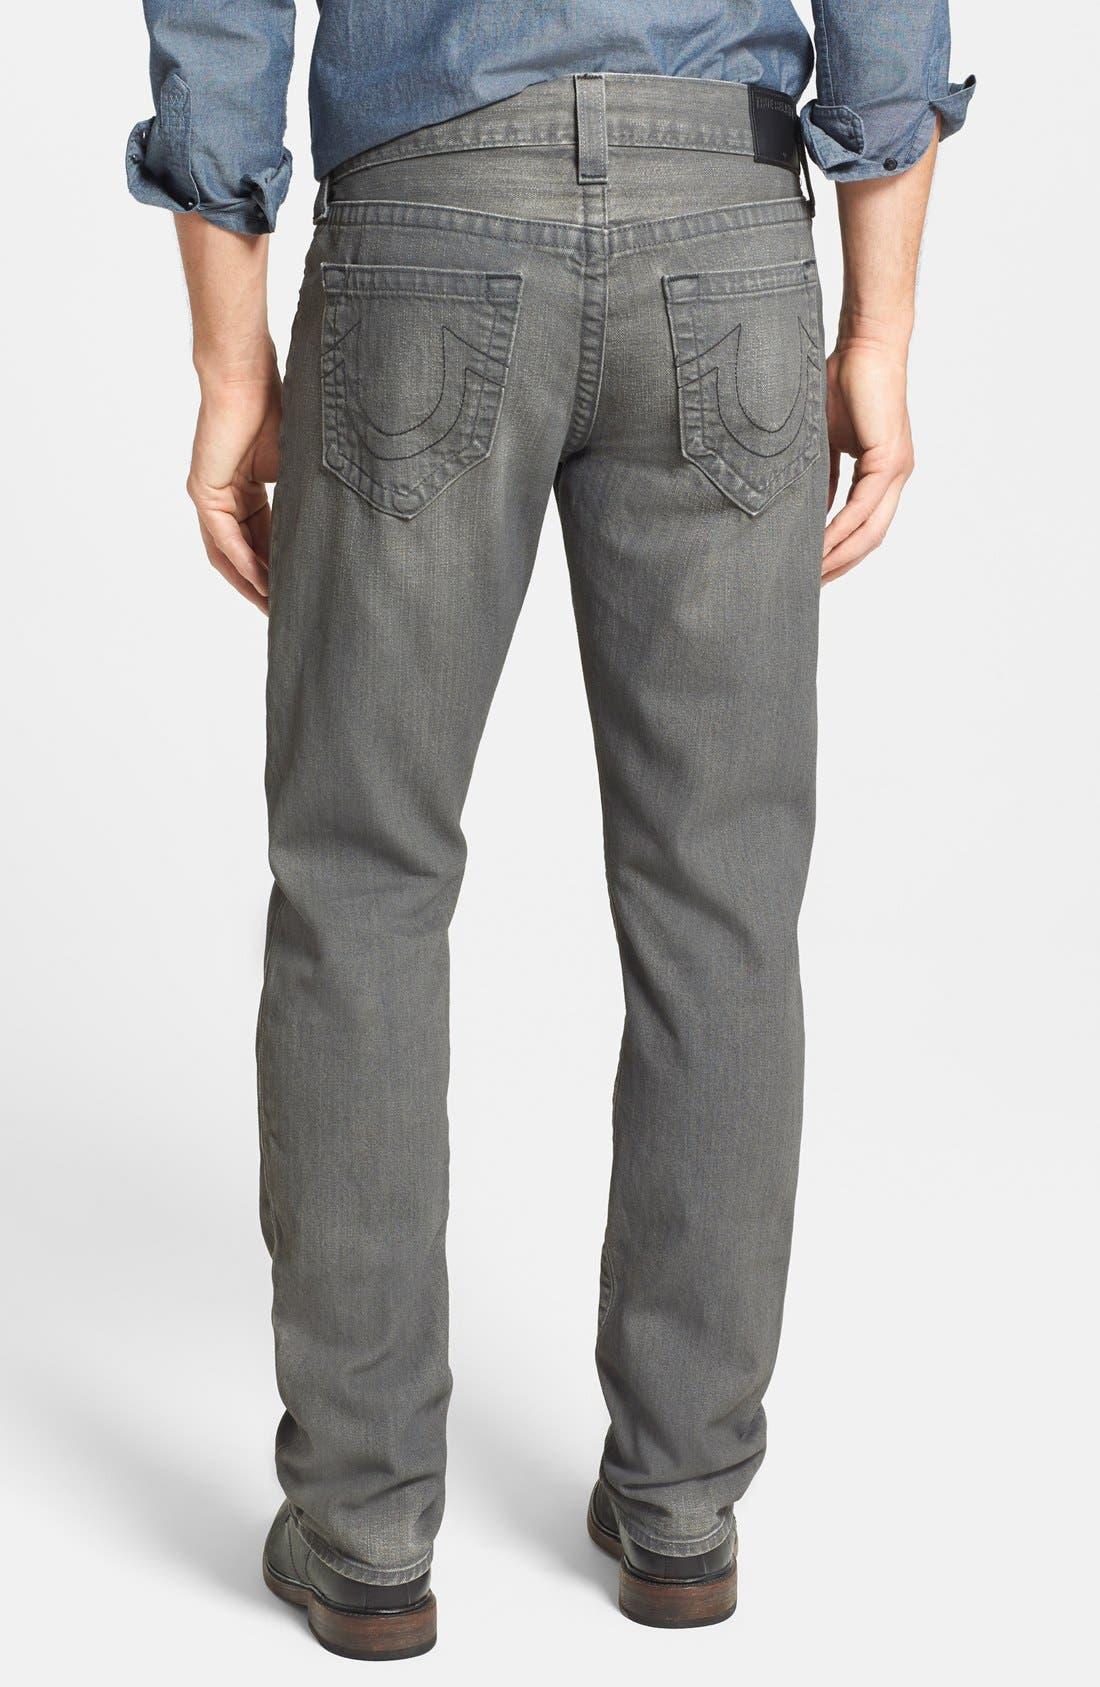 Alternate Image 2  - True Religion Brand Jeans 'Geno' Straight Leg Jeans (Concrete Hill)